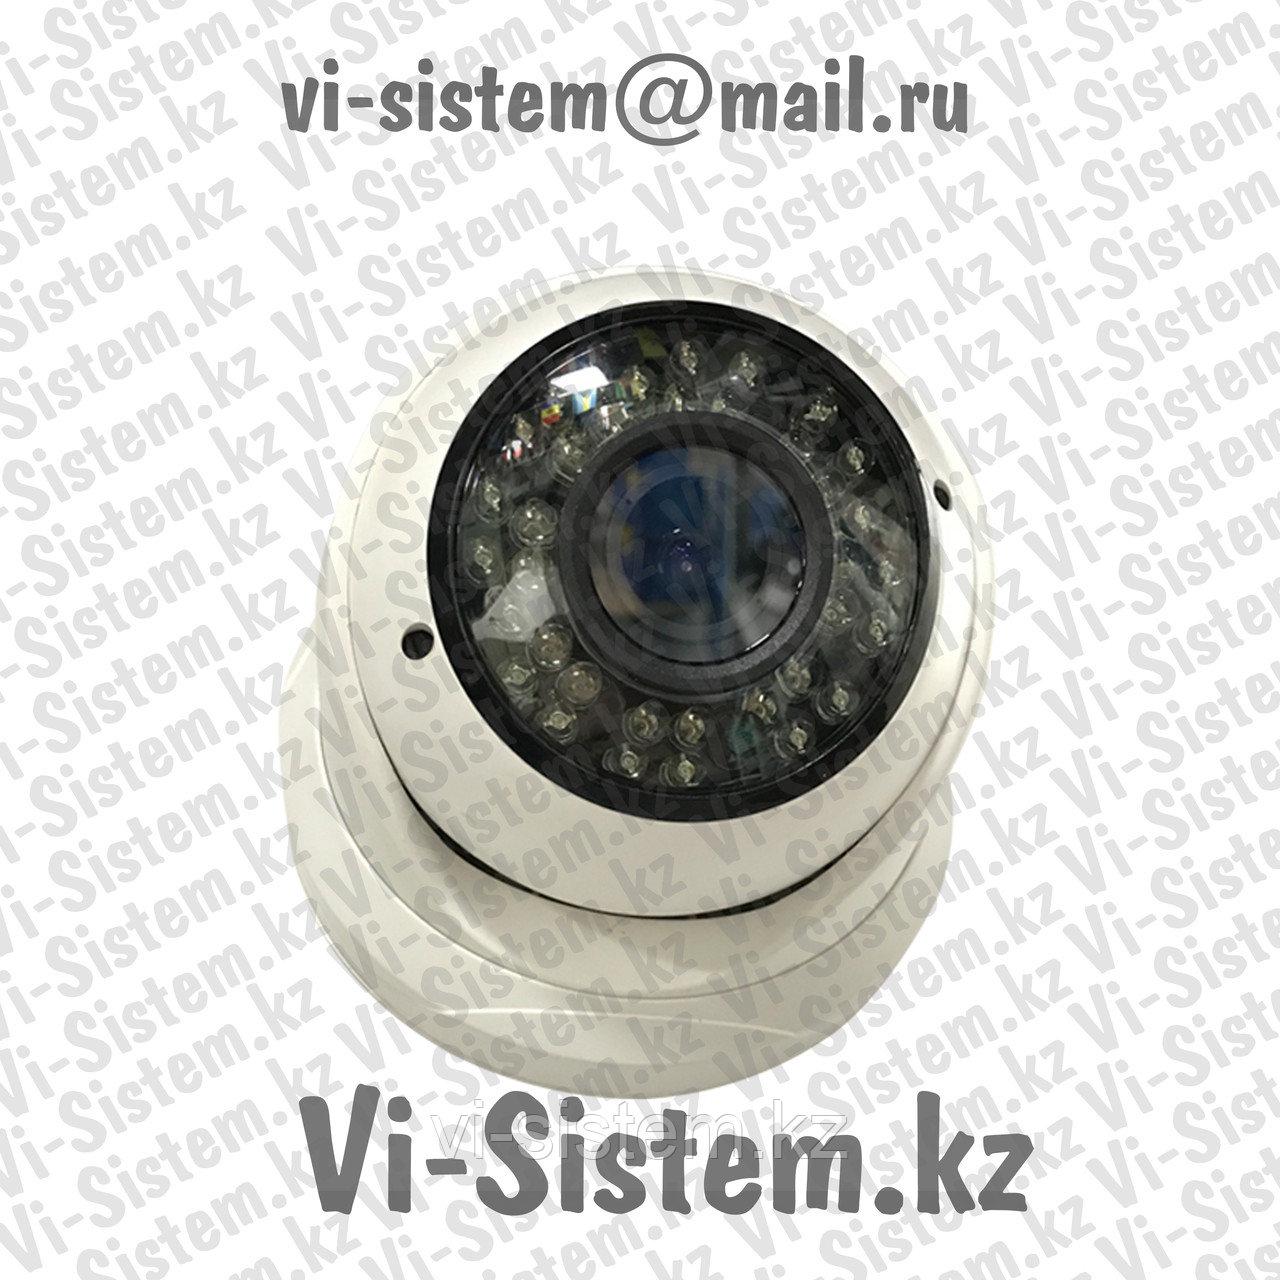 IP-Видеокамера SYNCAR SY-183 2MP